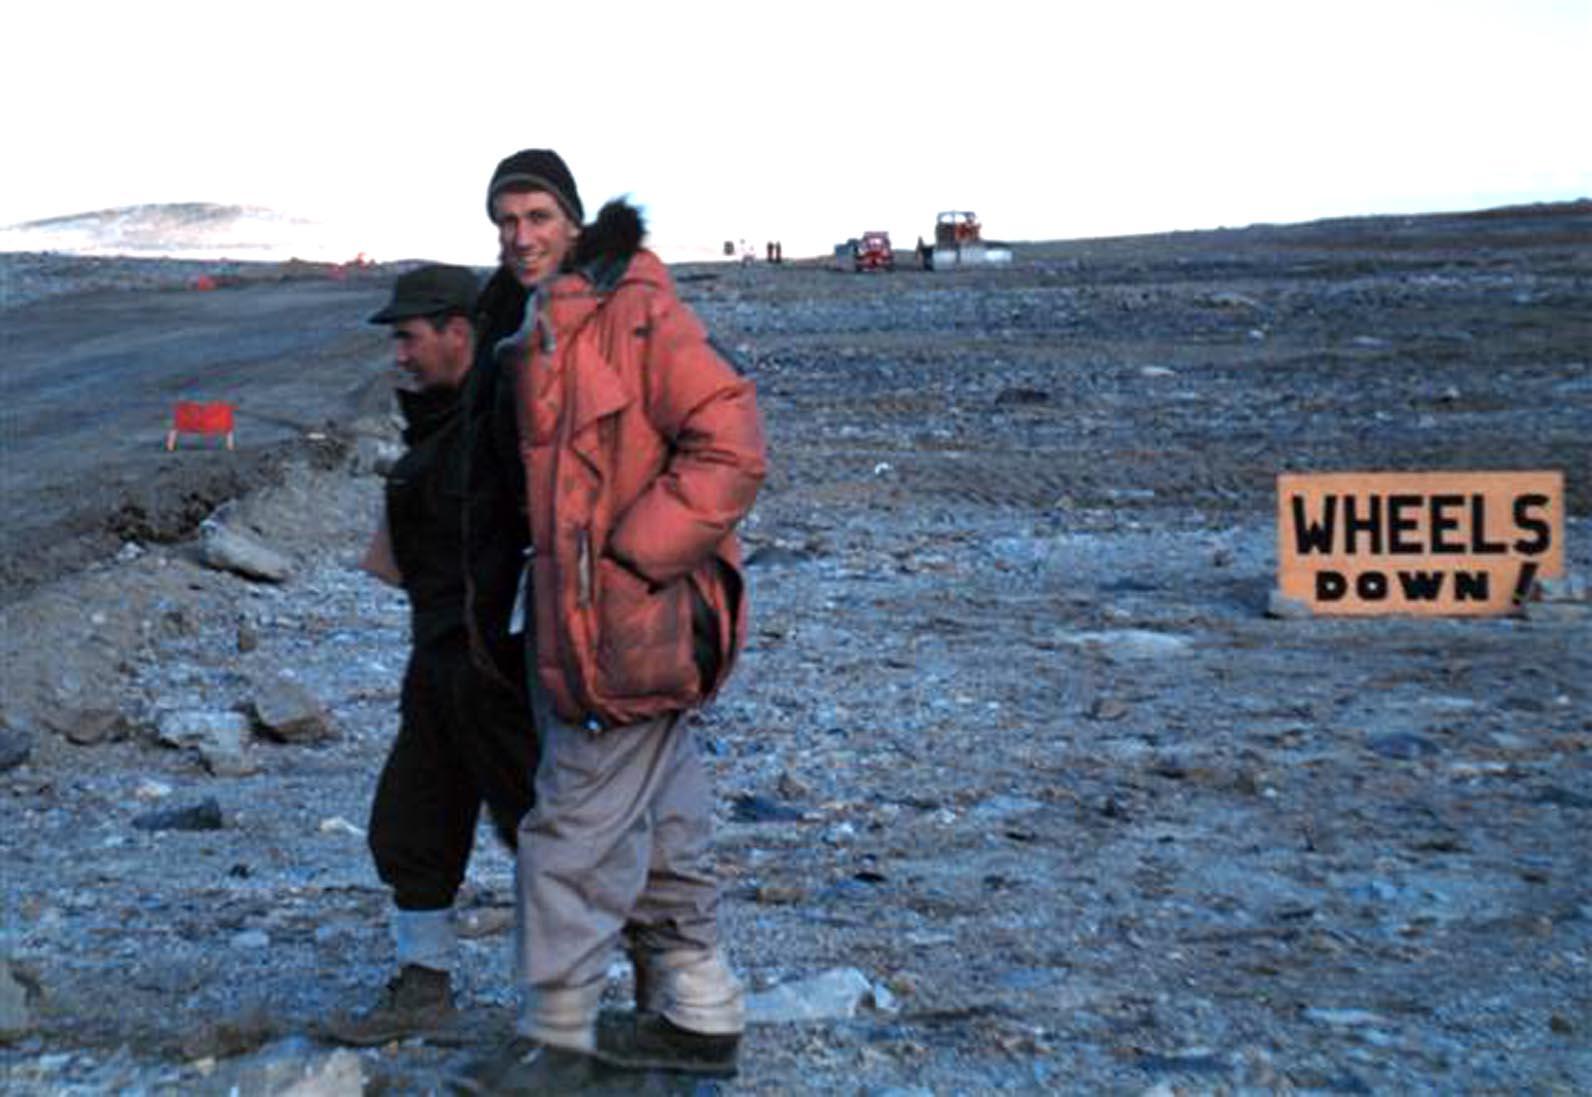 Two people walk across rocky ground.